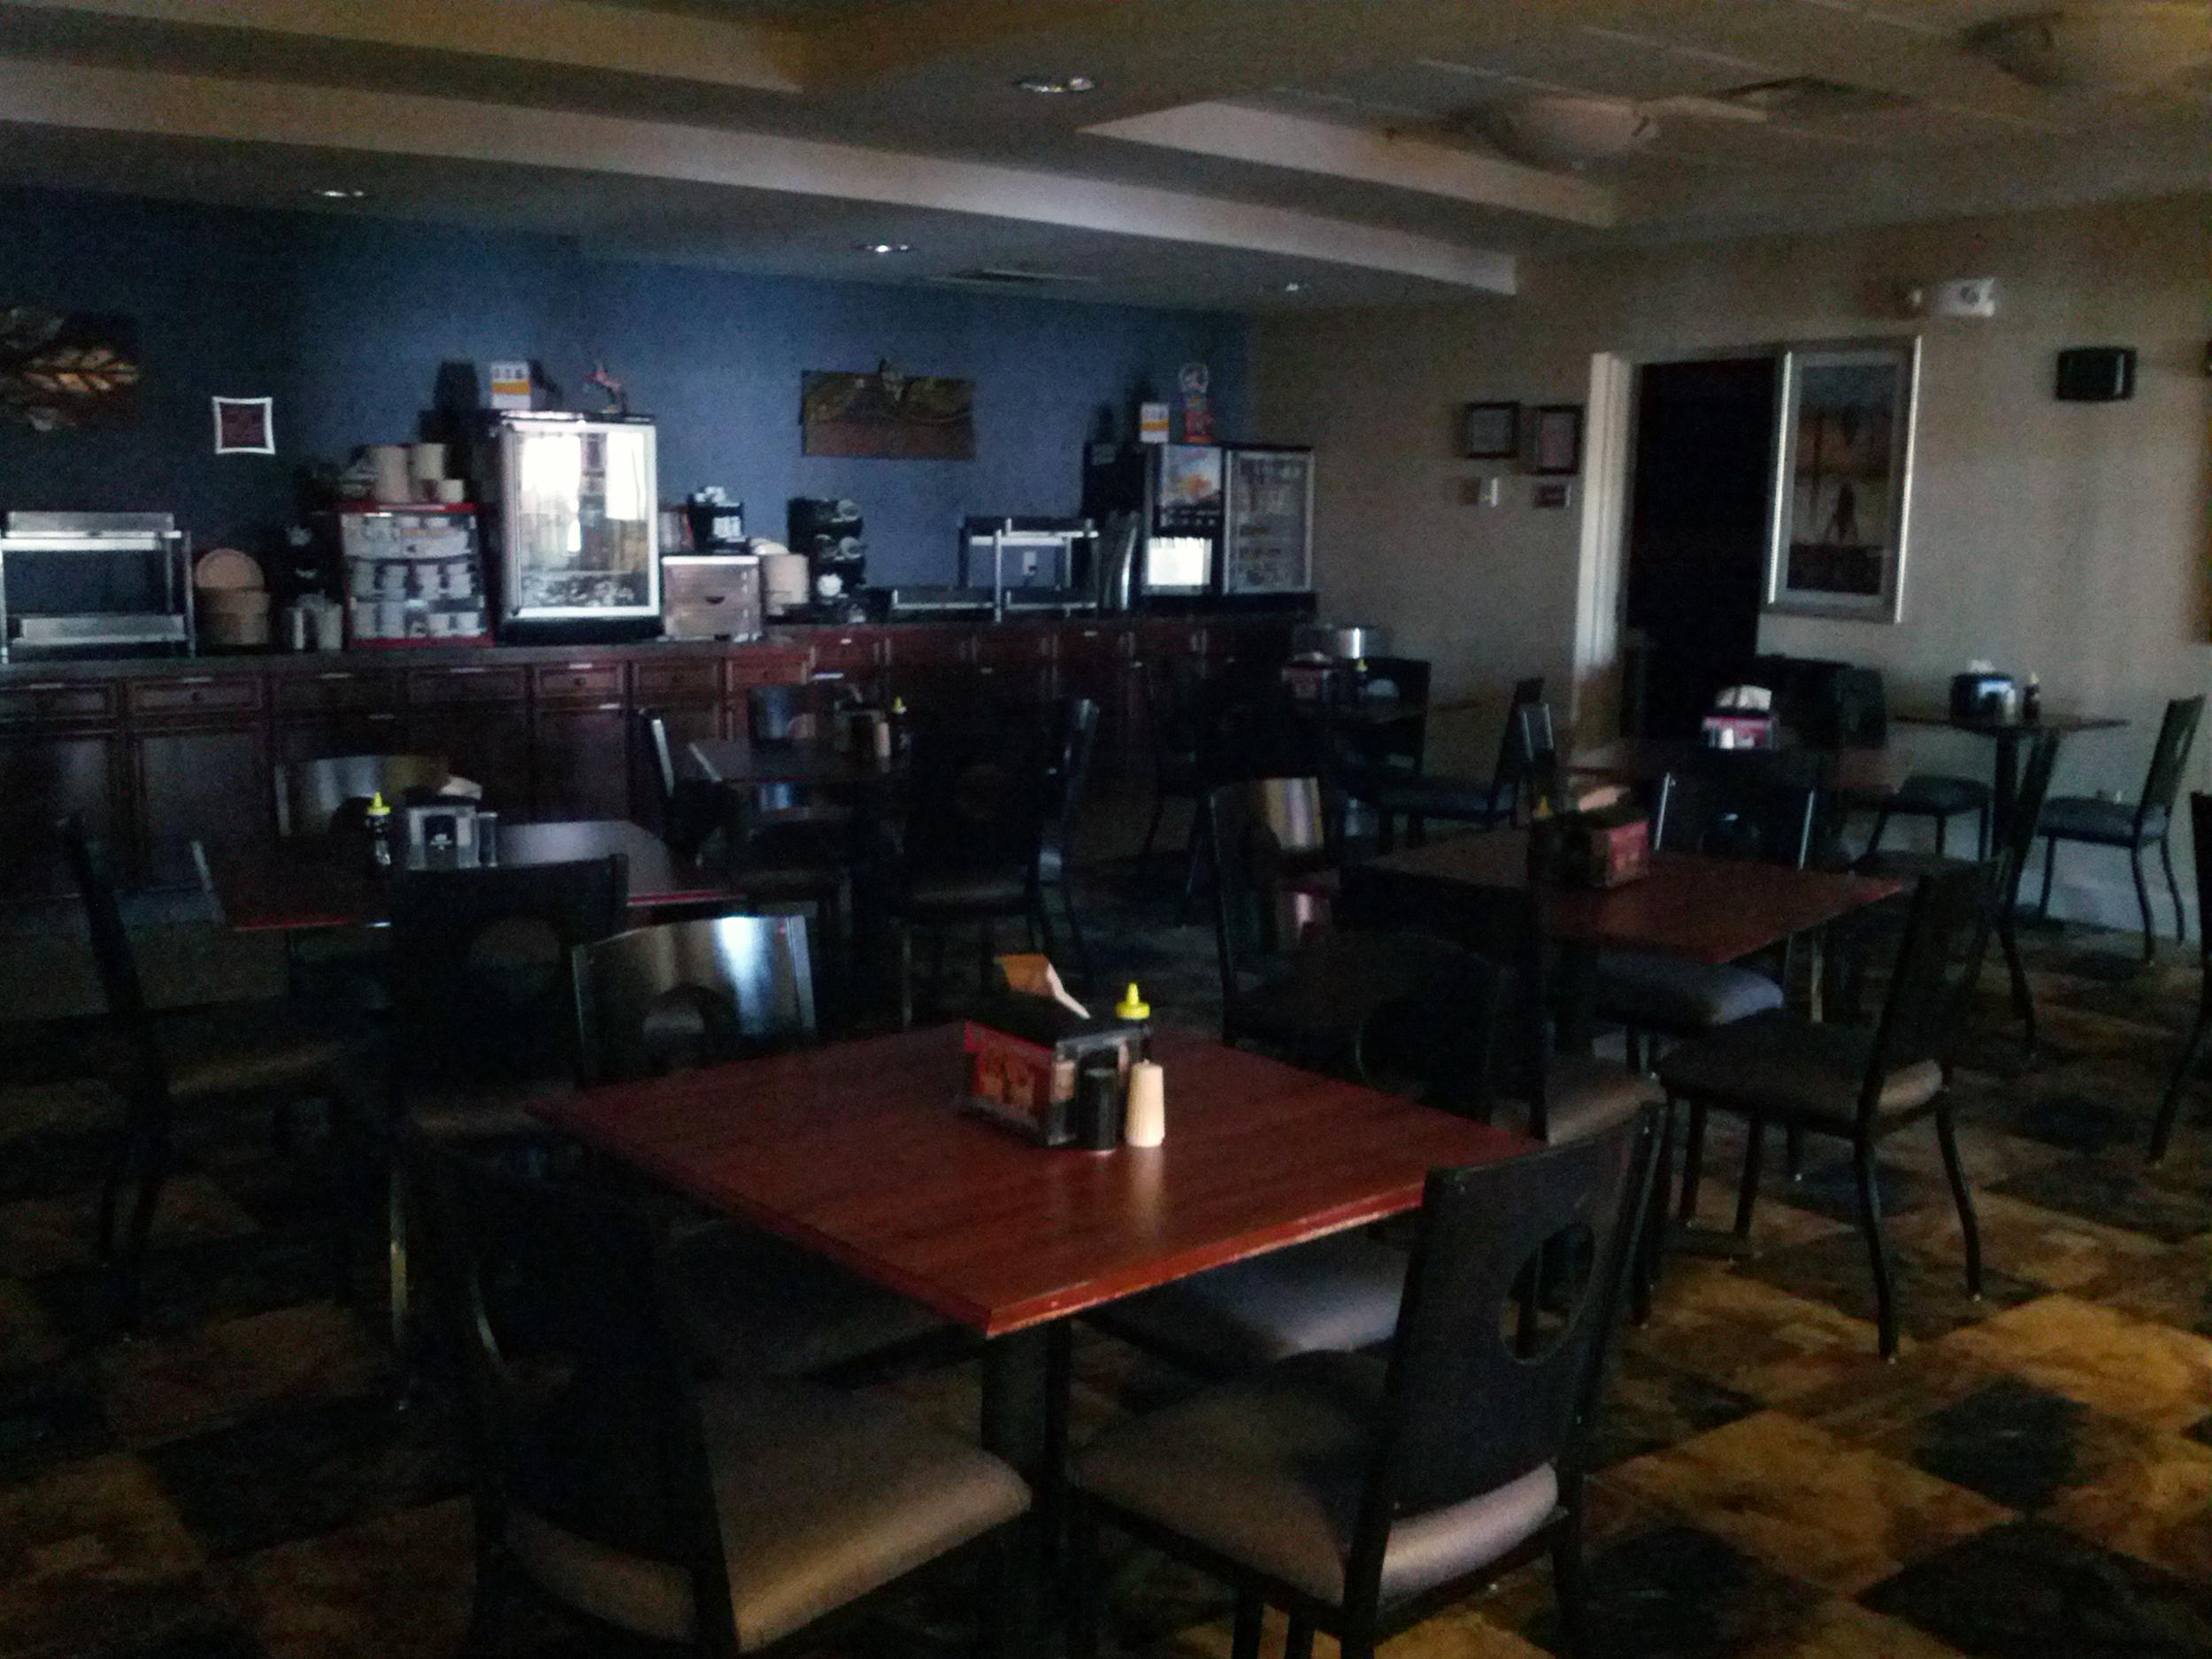 2013-09-26 Clarion Inn, Pigeon Forge TN (18)